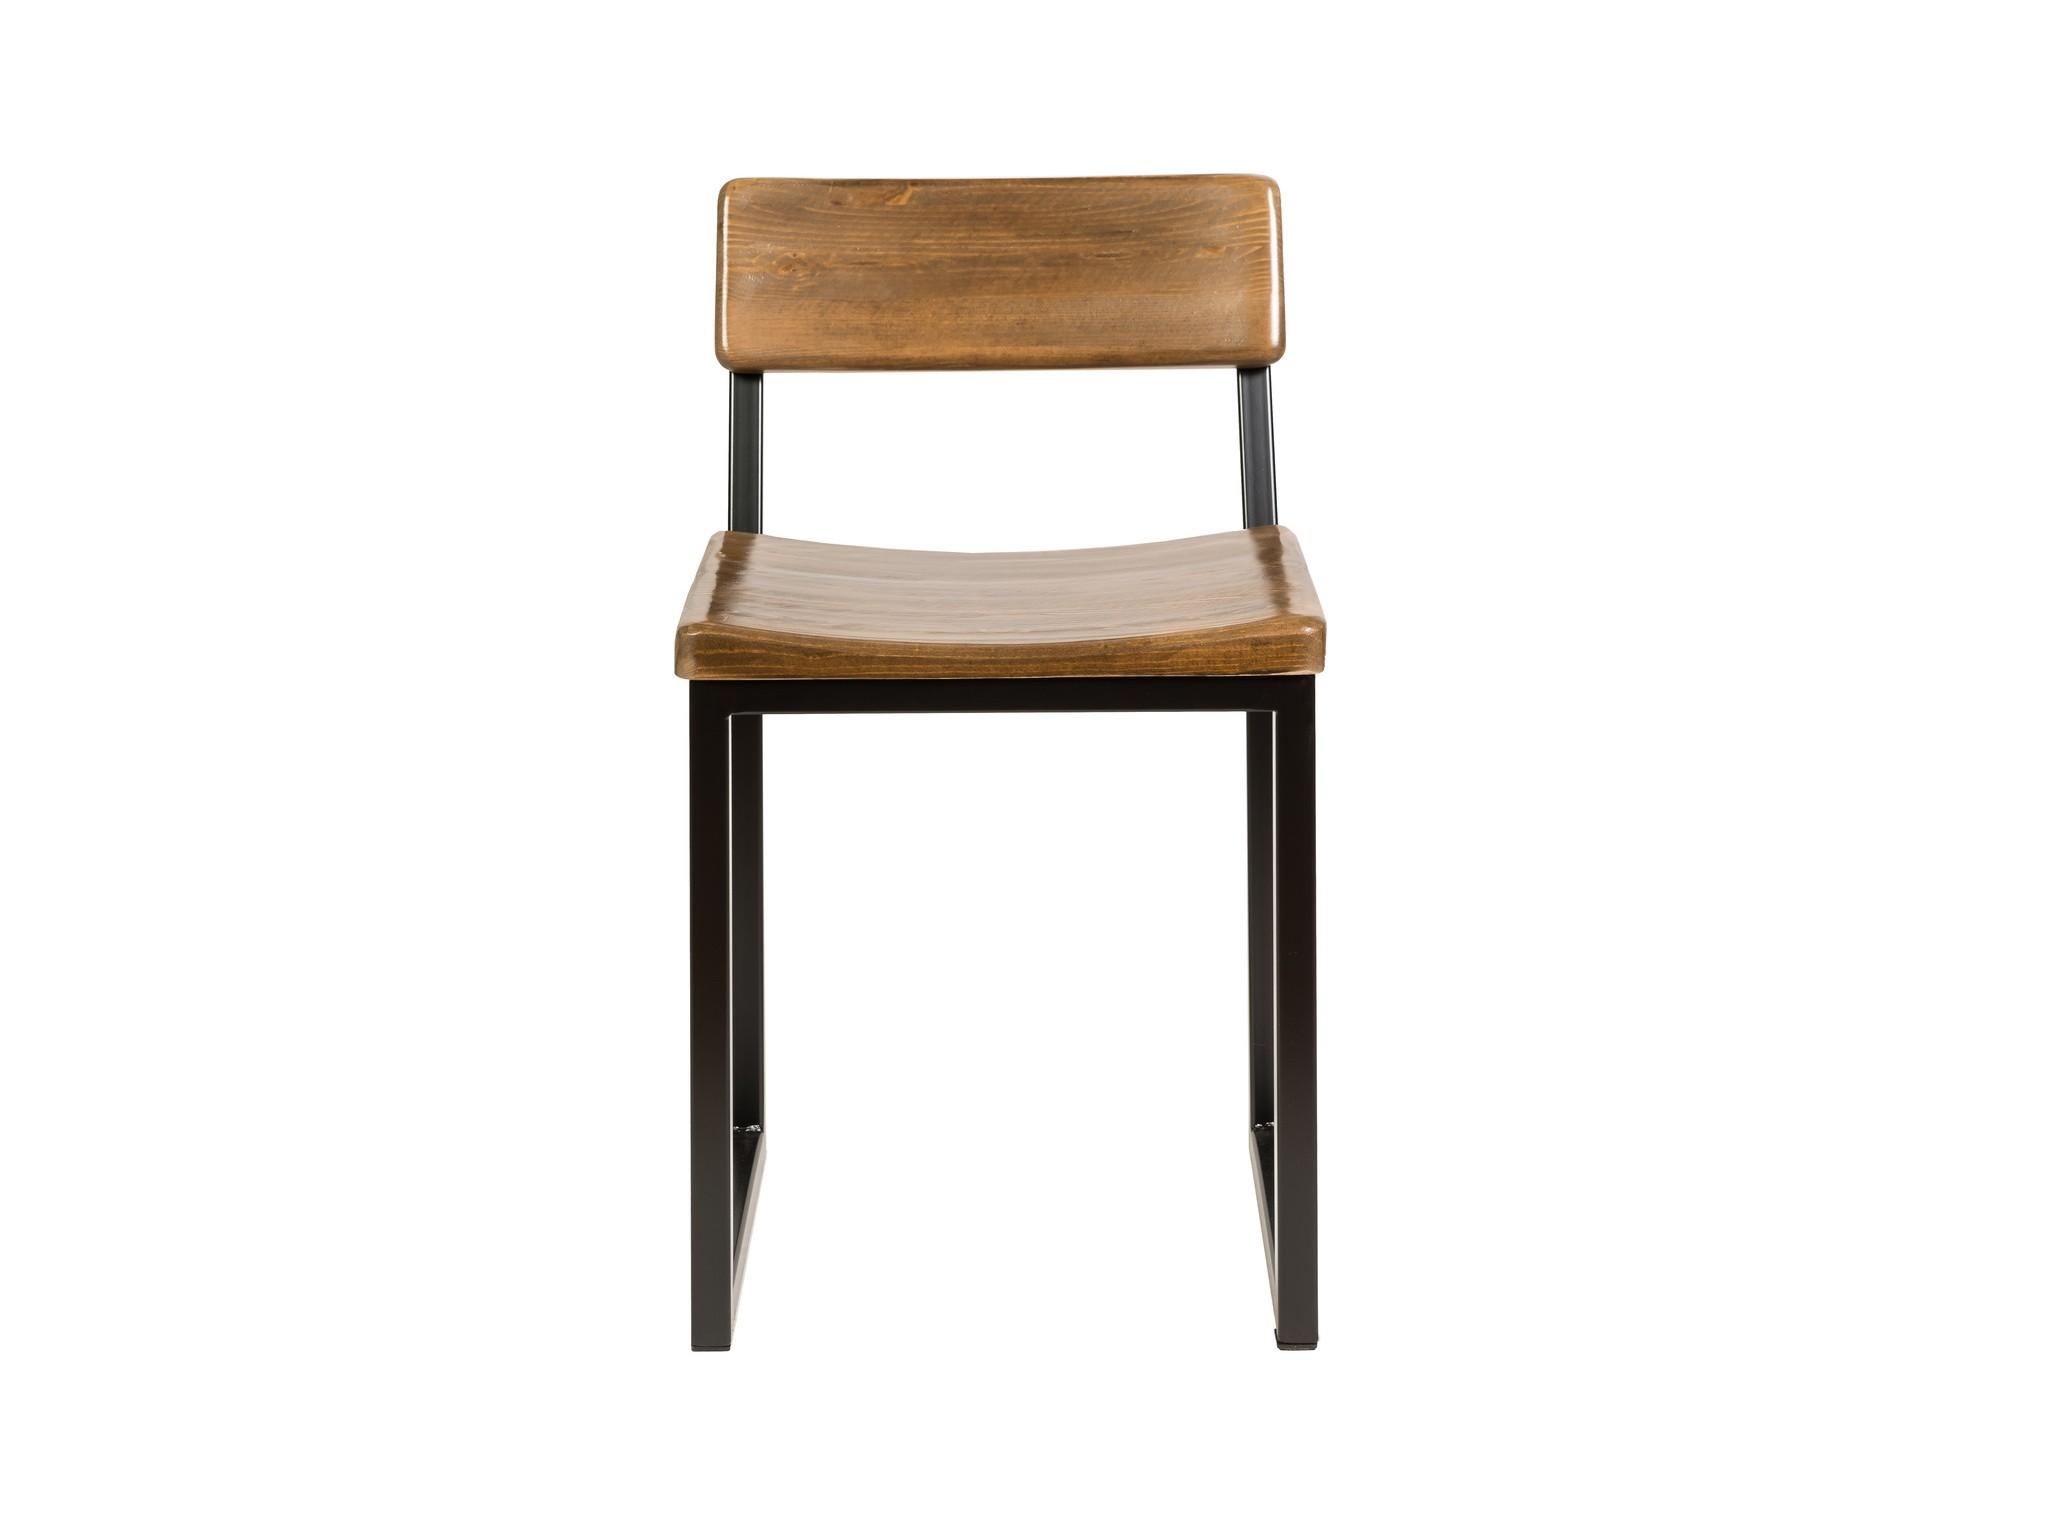 Кухонный стул Idea 6176141 от thefurnish